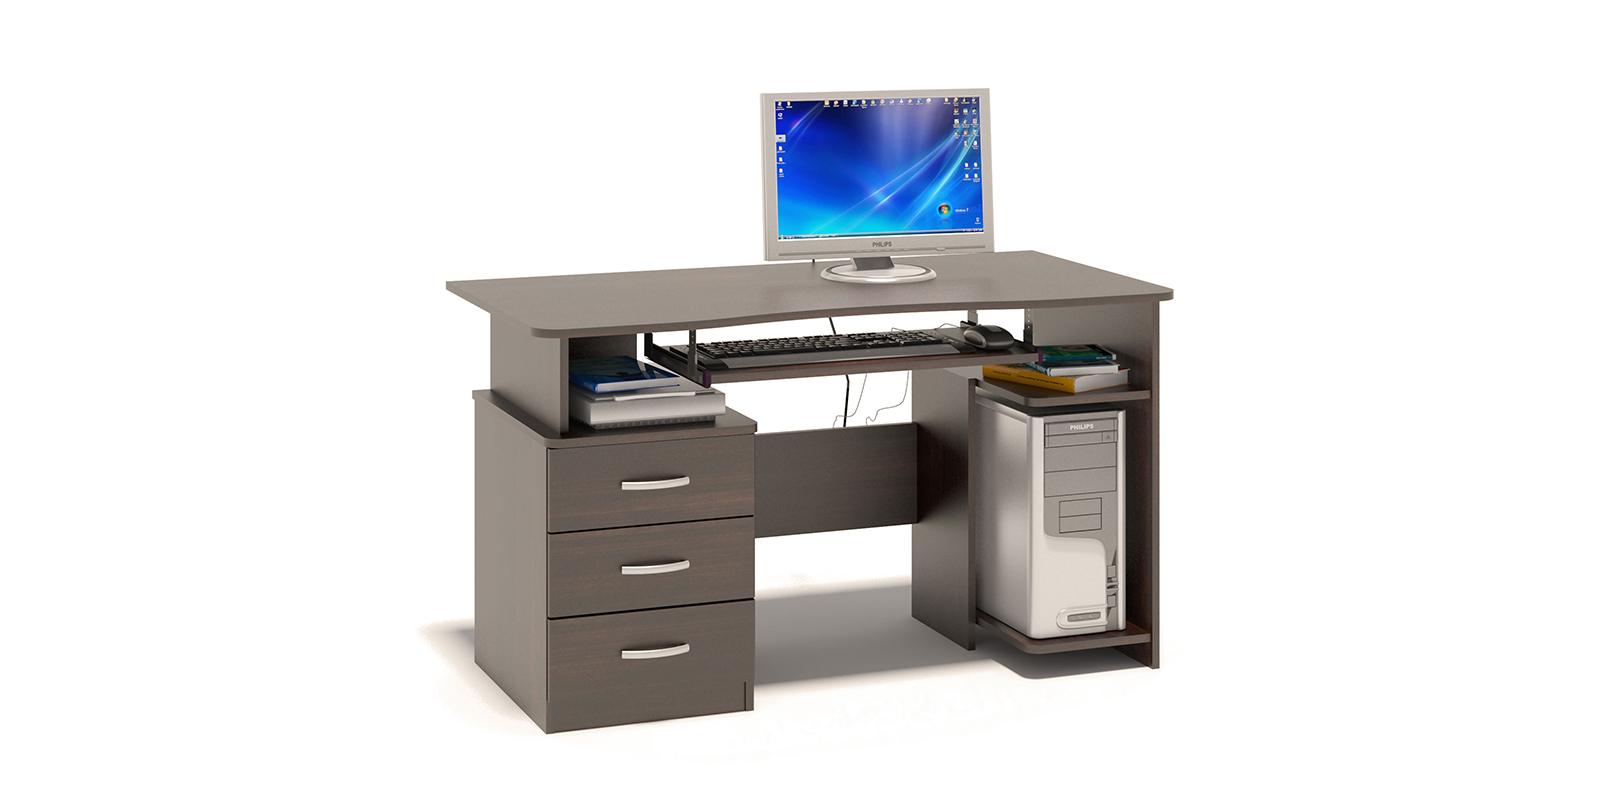 Стол компьютерный HomeMe Рико компьютерный стол в глянце